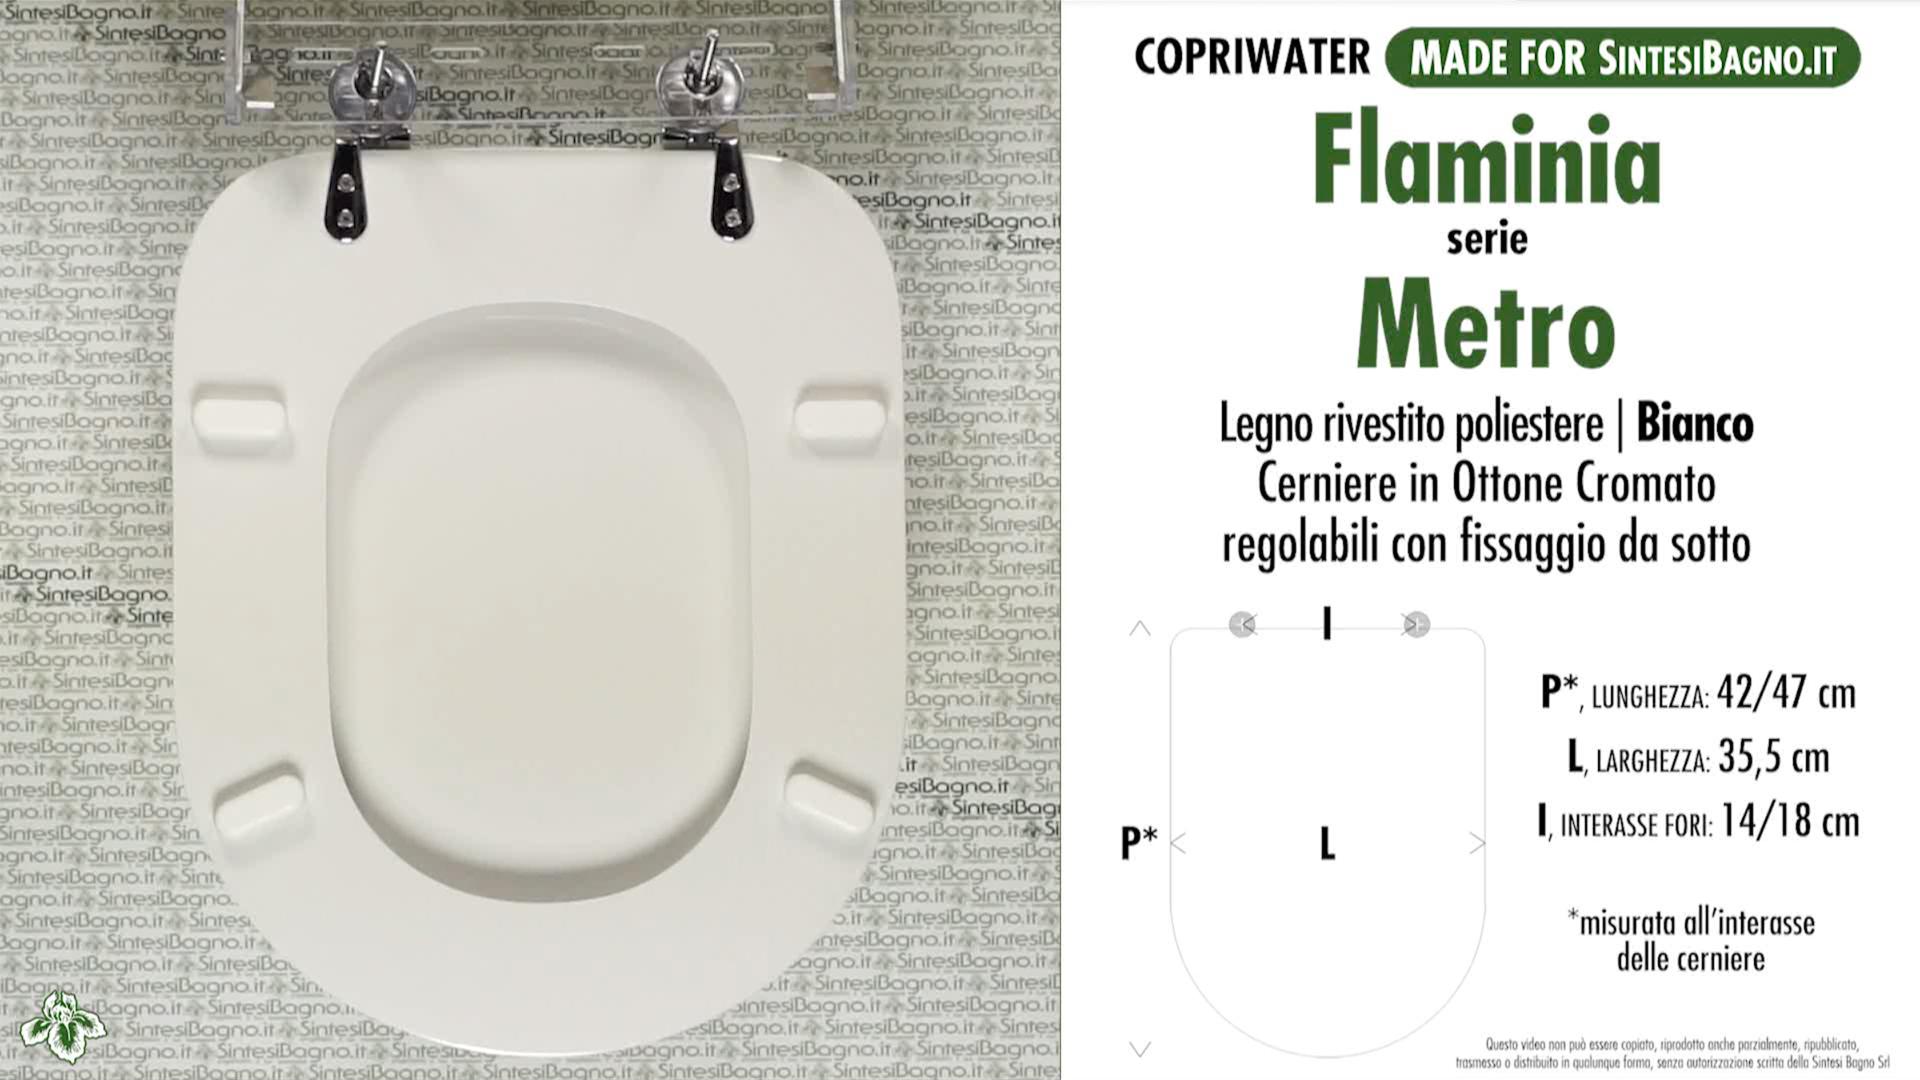 SCHEDA TECNICA MISURE copriwater FLAMINIA METRO